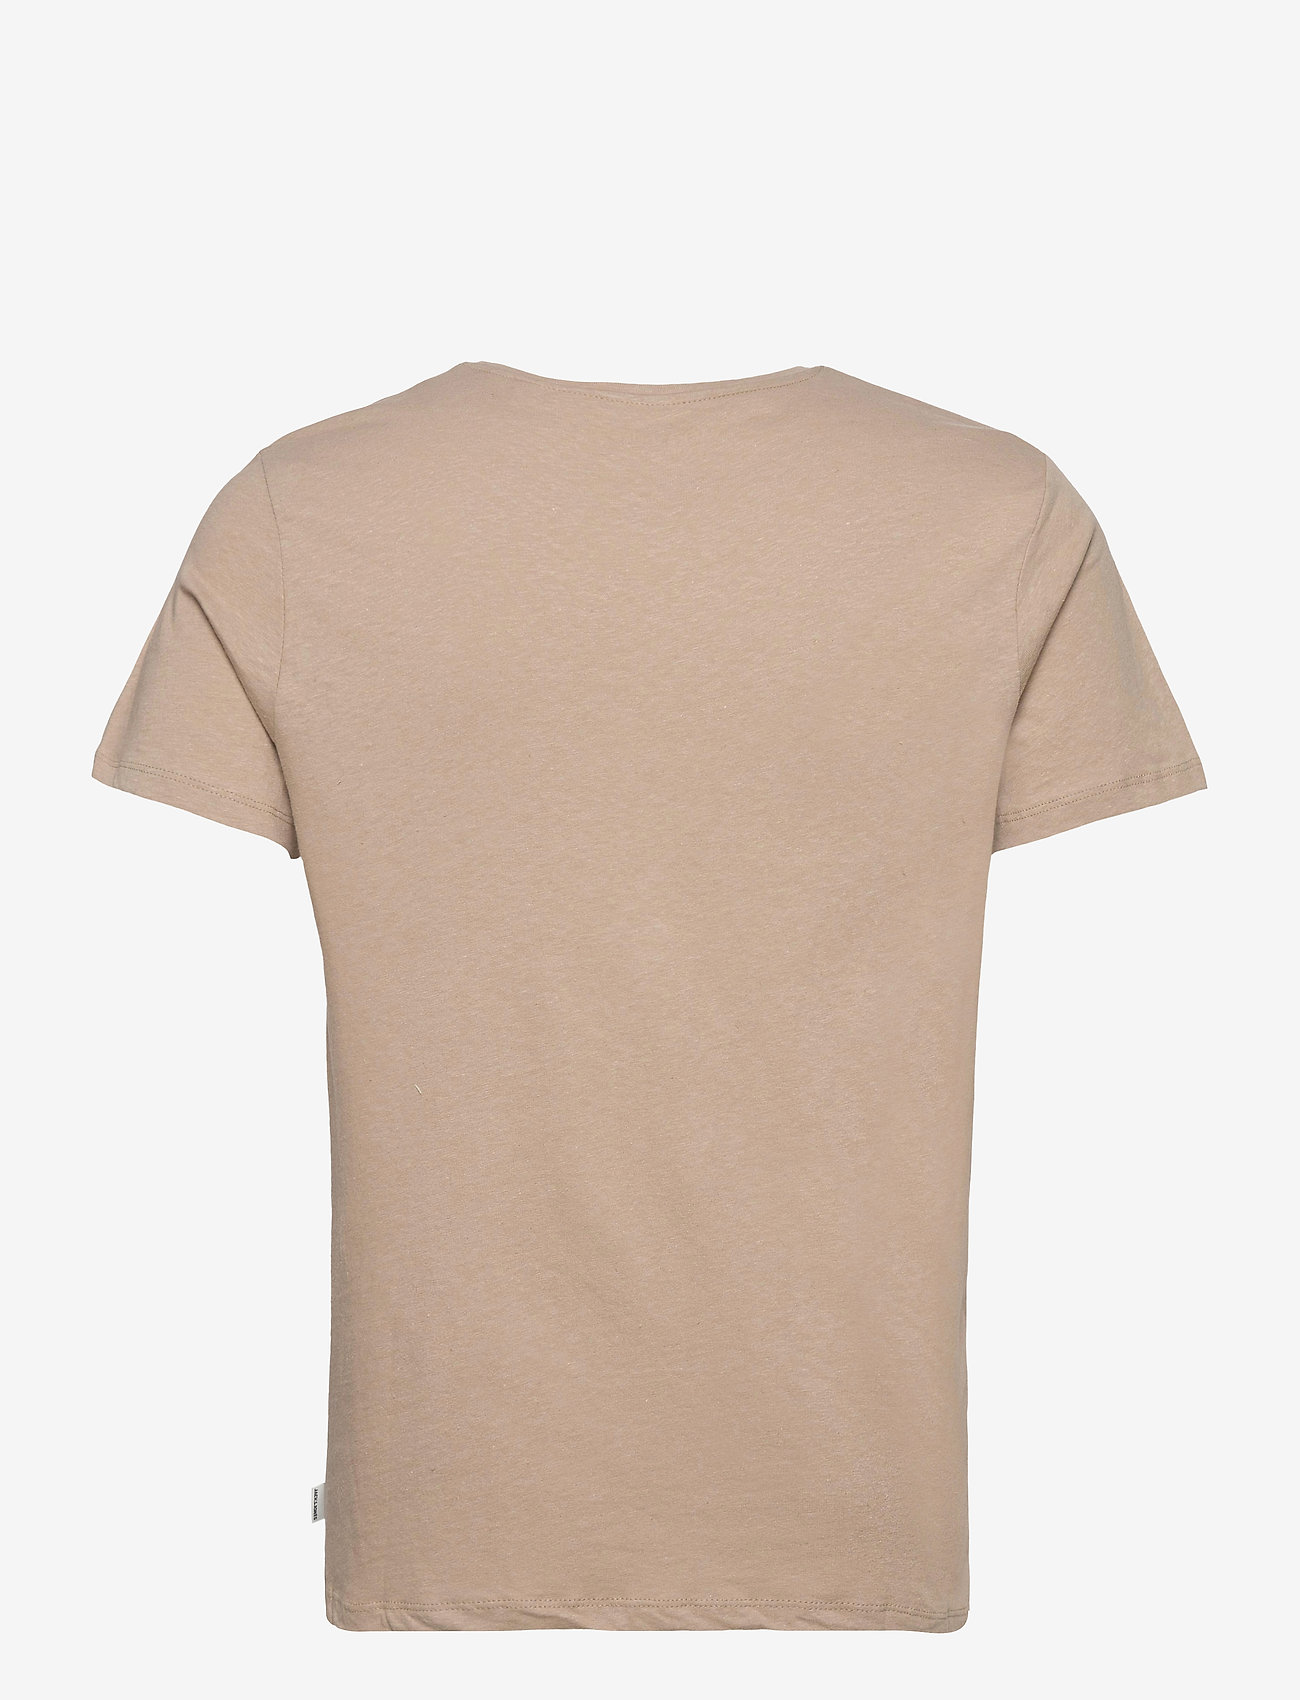 Jack & Jones - JJELINEN BASIC TEE SS CREW NECK STS - basic t-shirts - crockery - 1